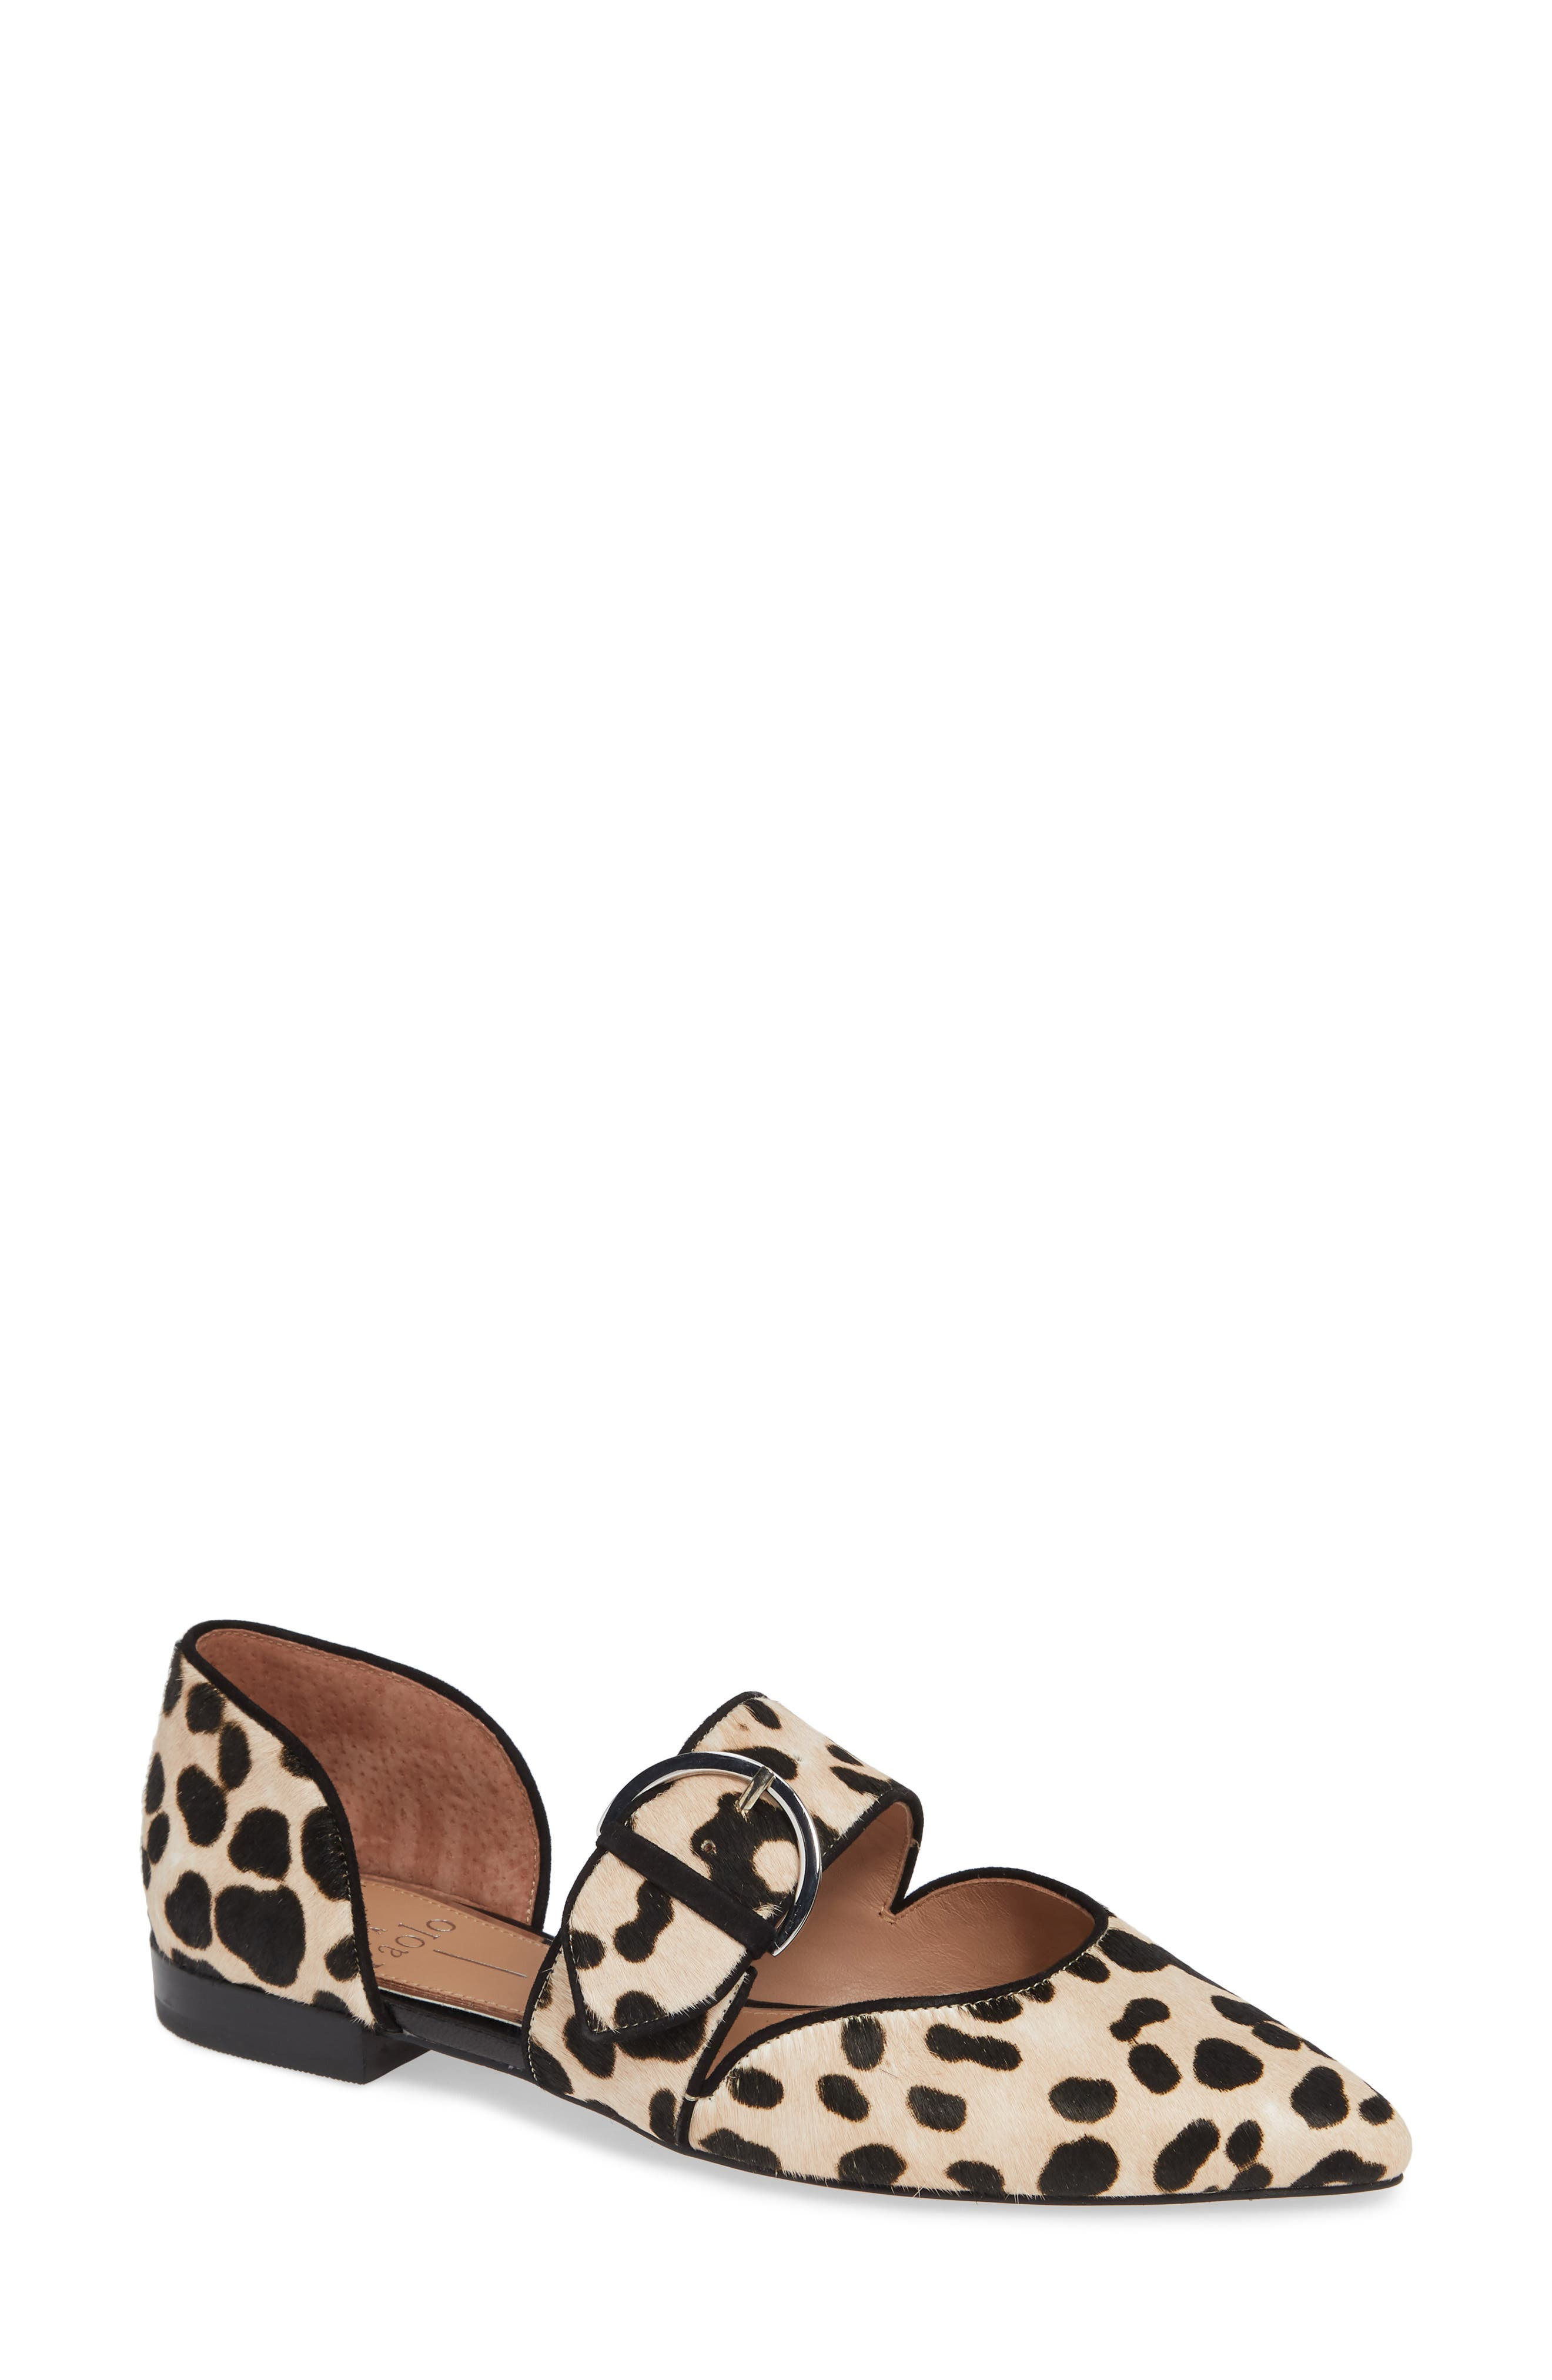 Dean Pointy Toe Flat,                             Main thumbnail 1, color,                             WHITE/ BLACK PRINT HAIRCALF